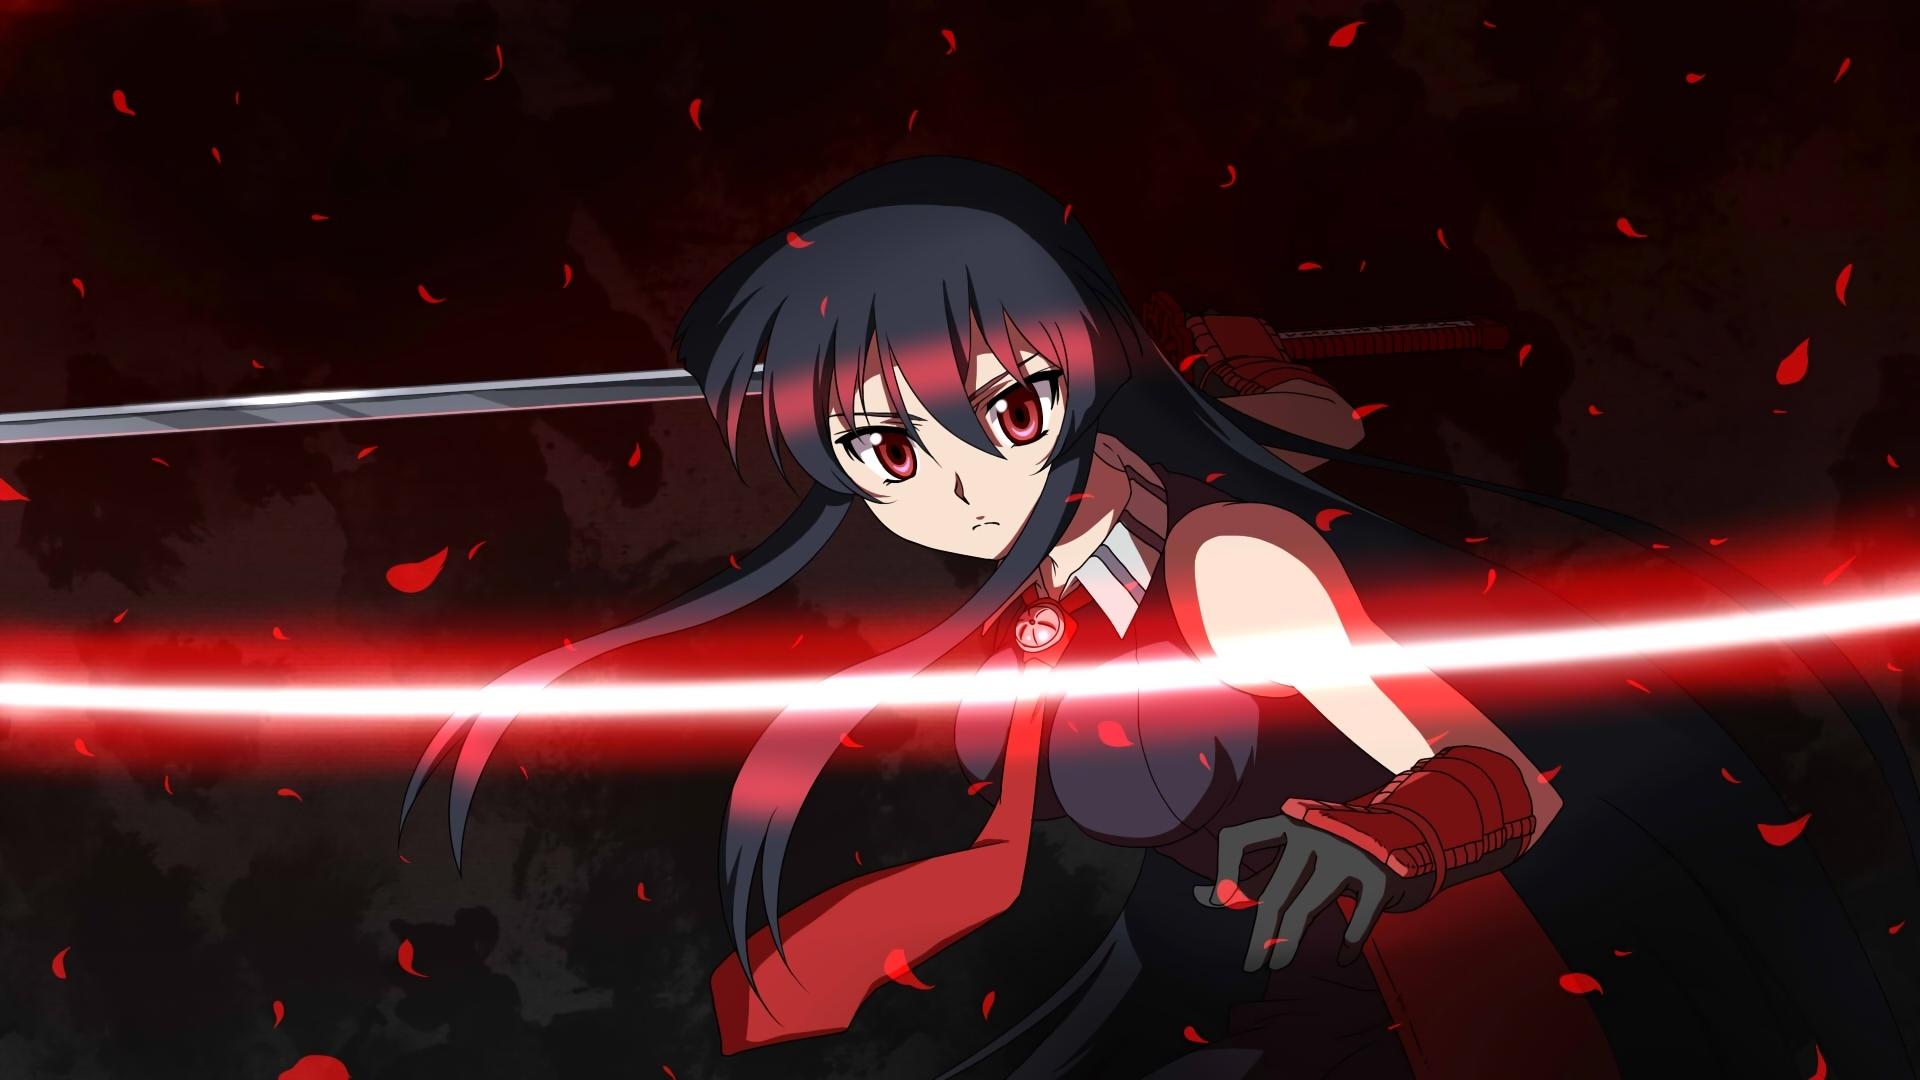 Akame Ga Kill 1080p wallpaper